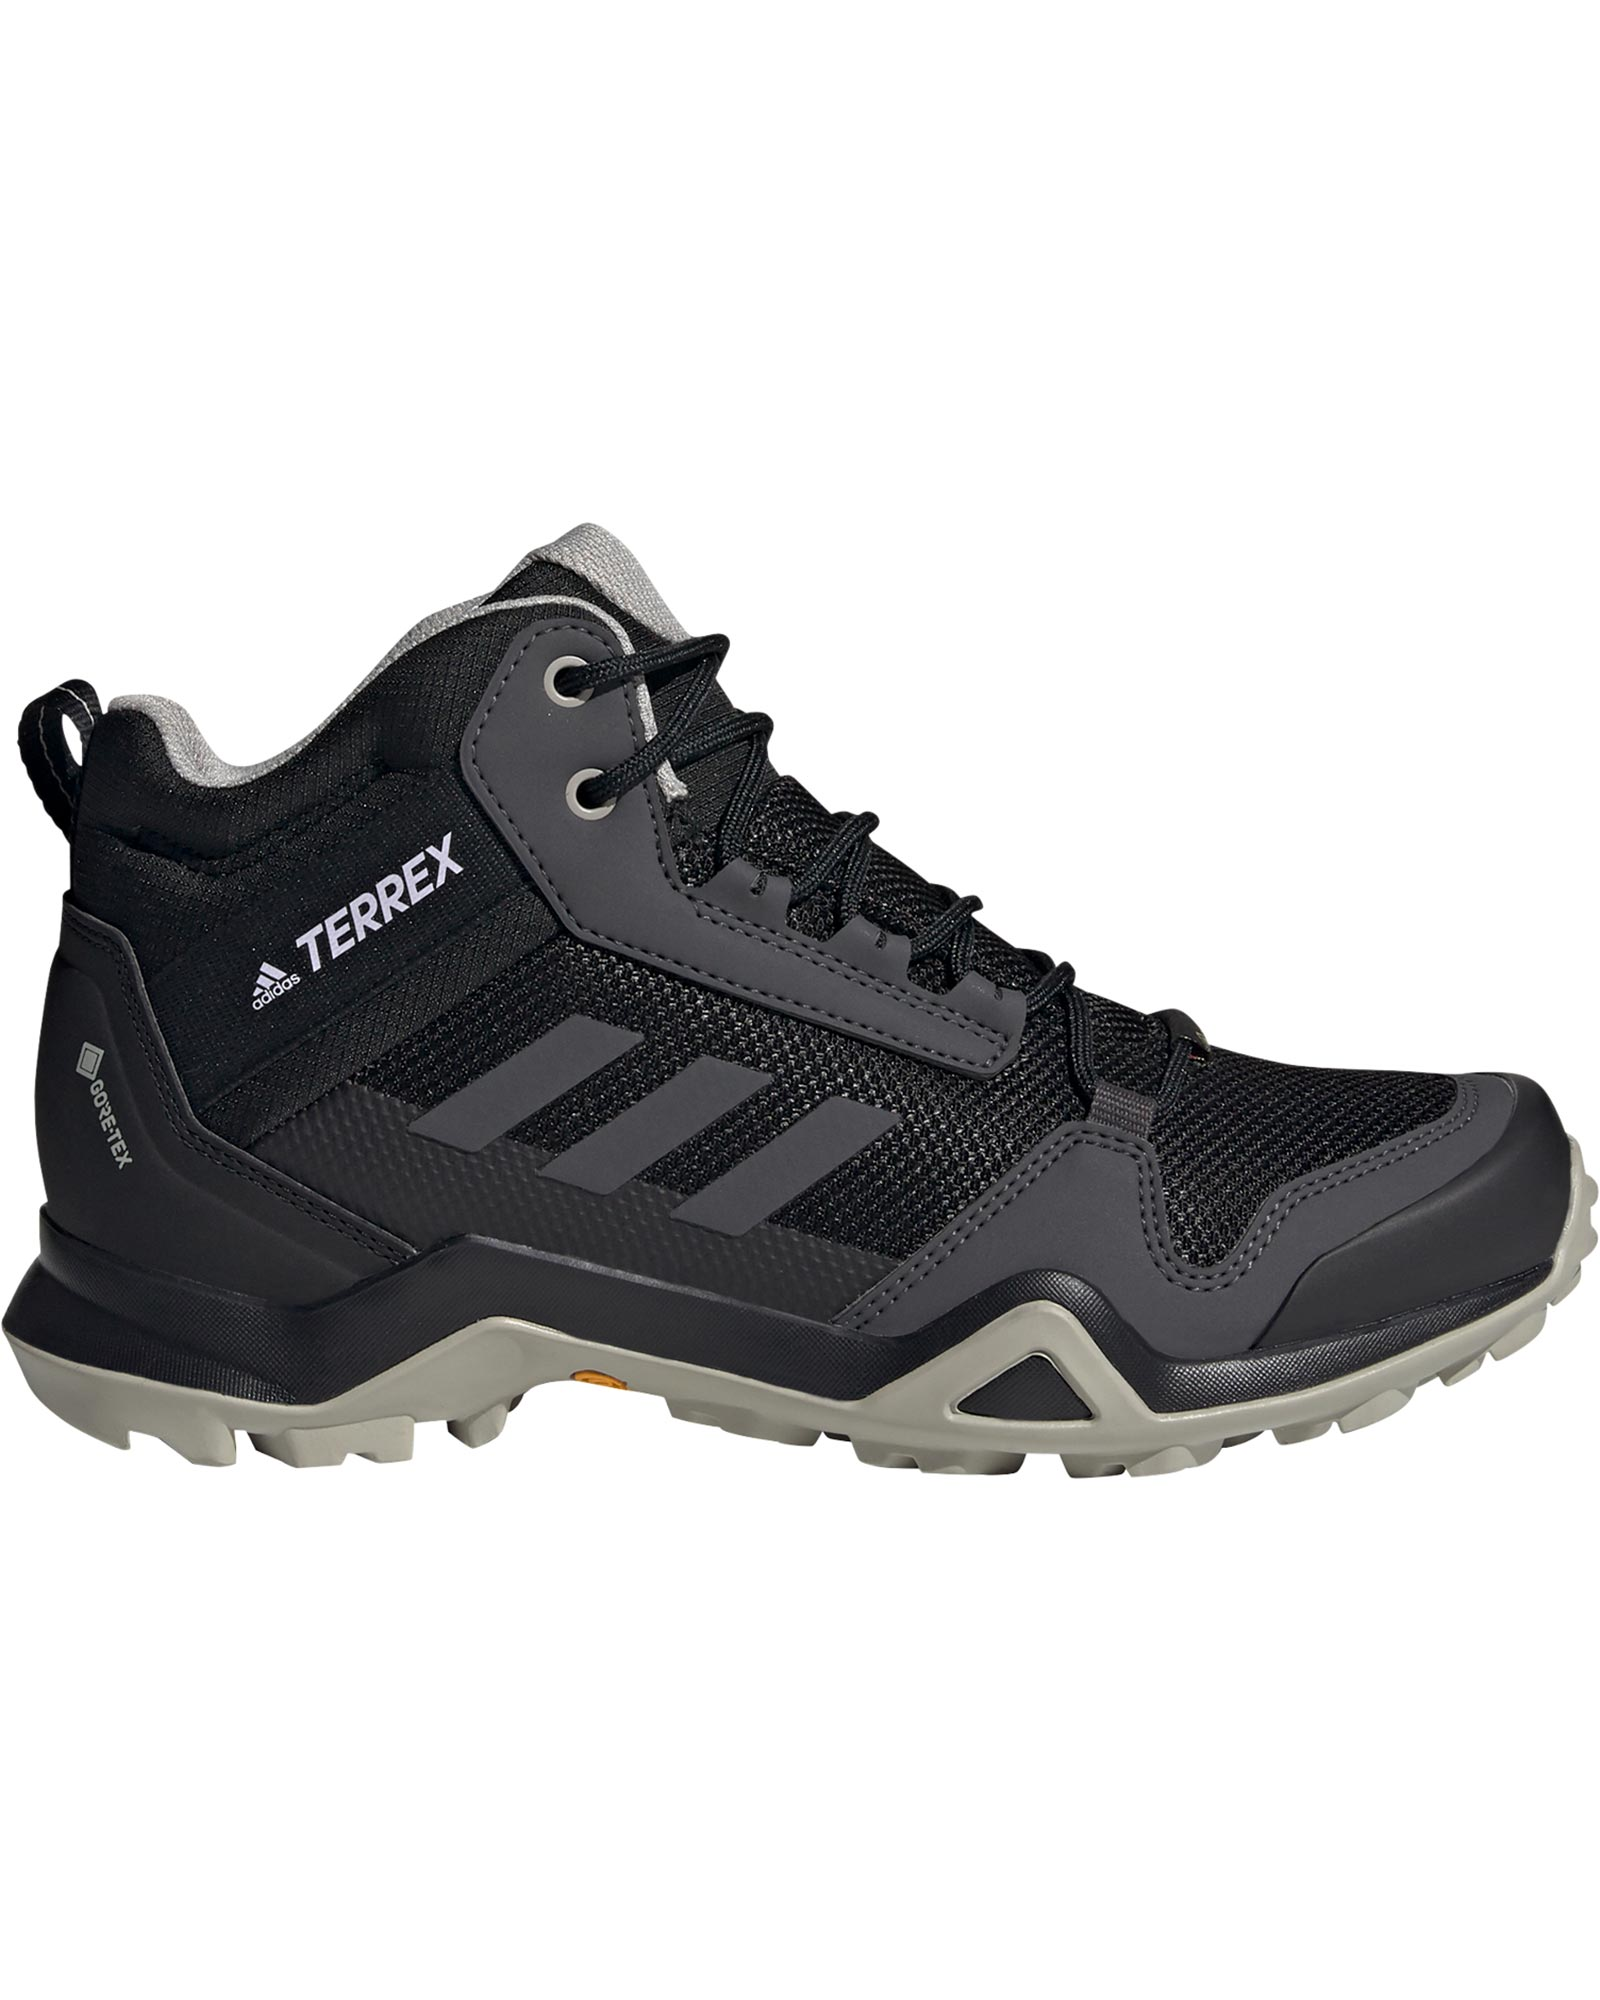 Adidas Terrex Terrex AX3 Mid GORE-TEX Women's Boots 6